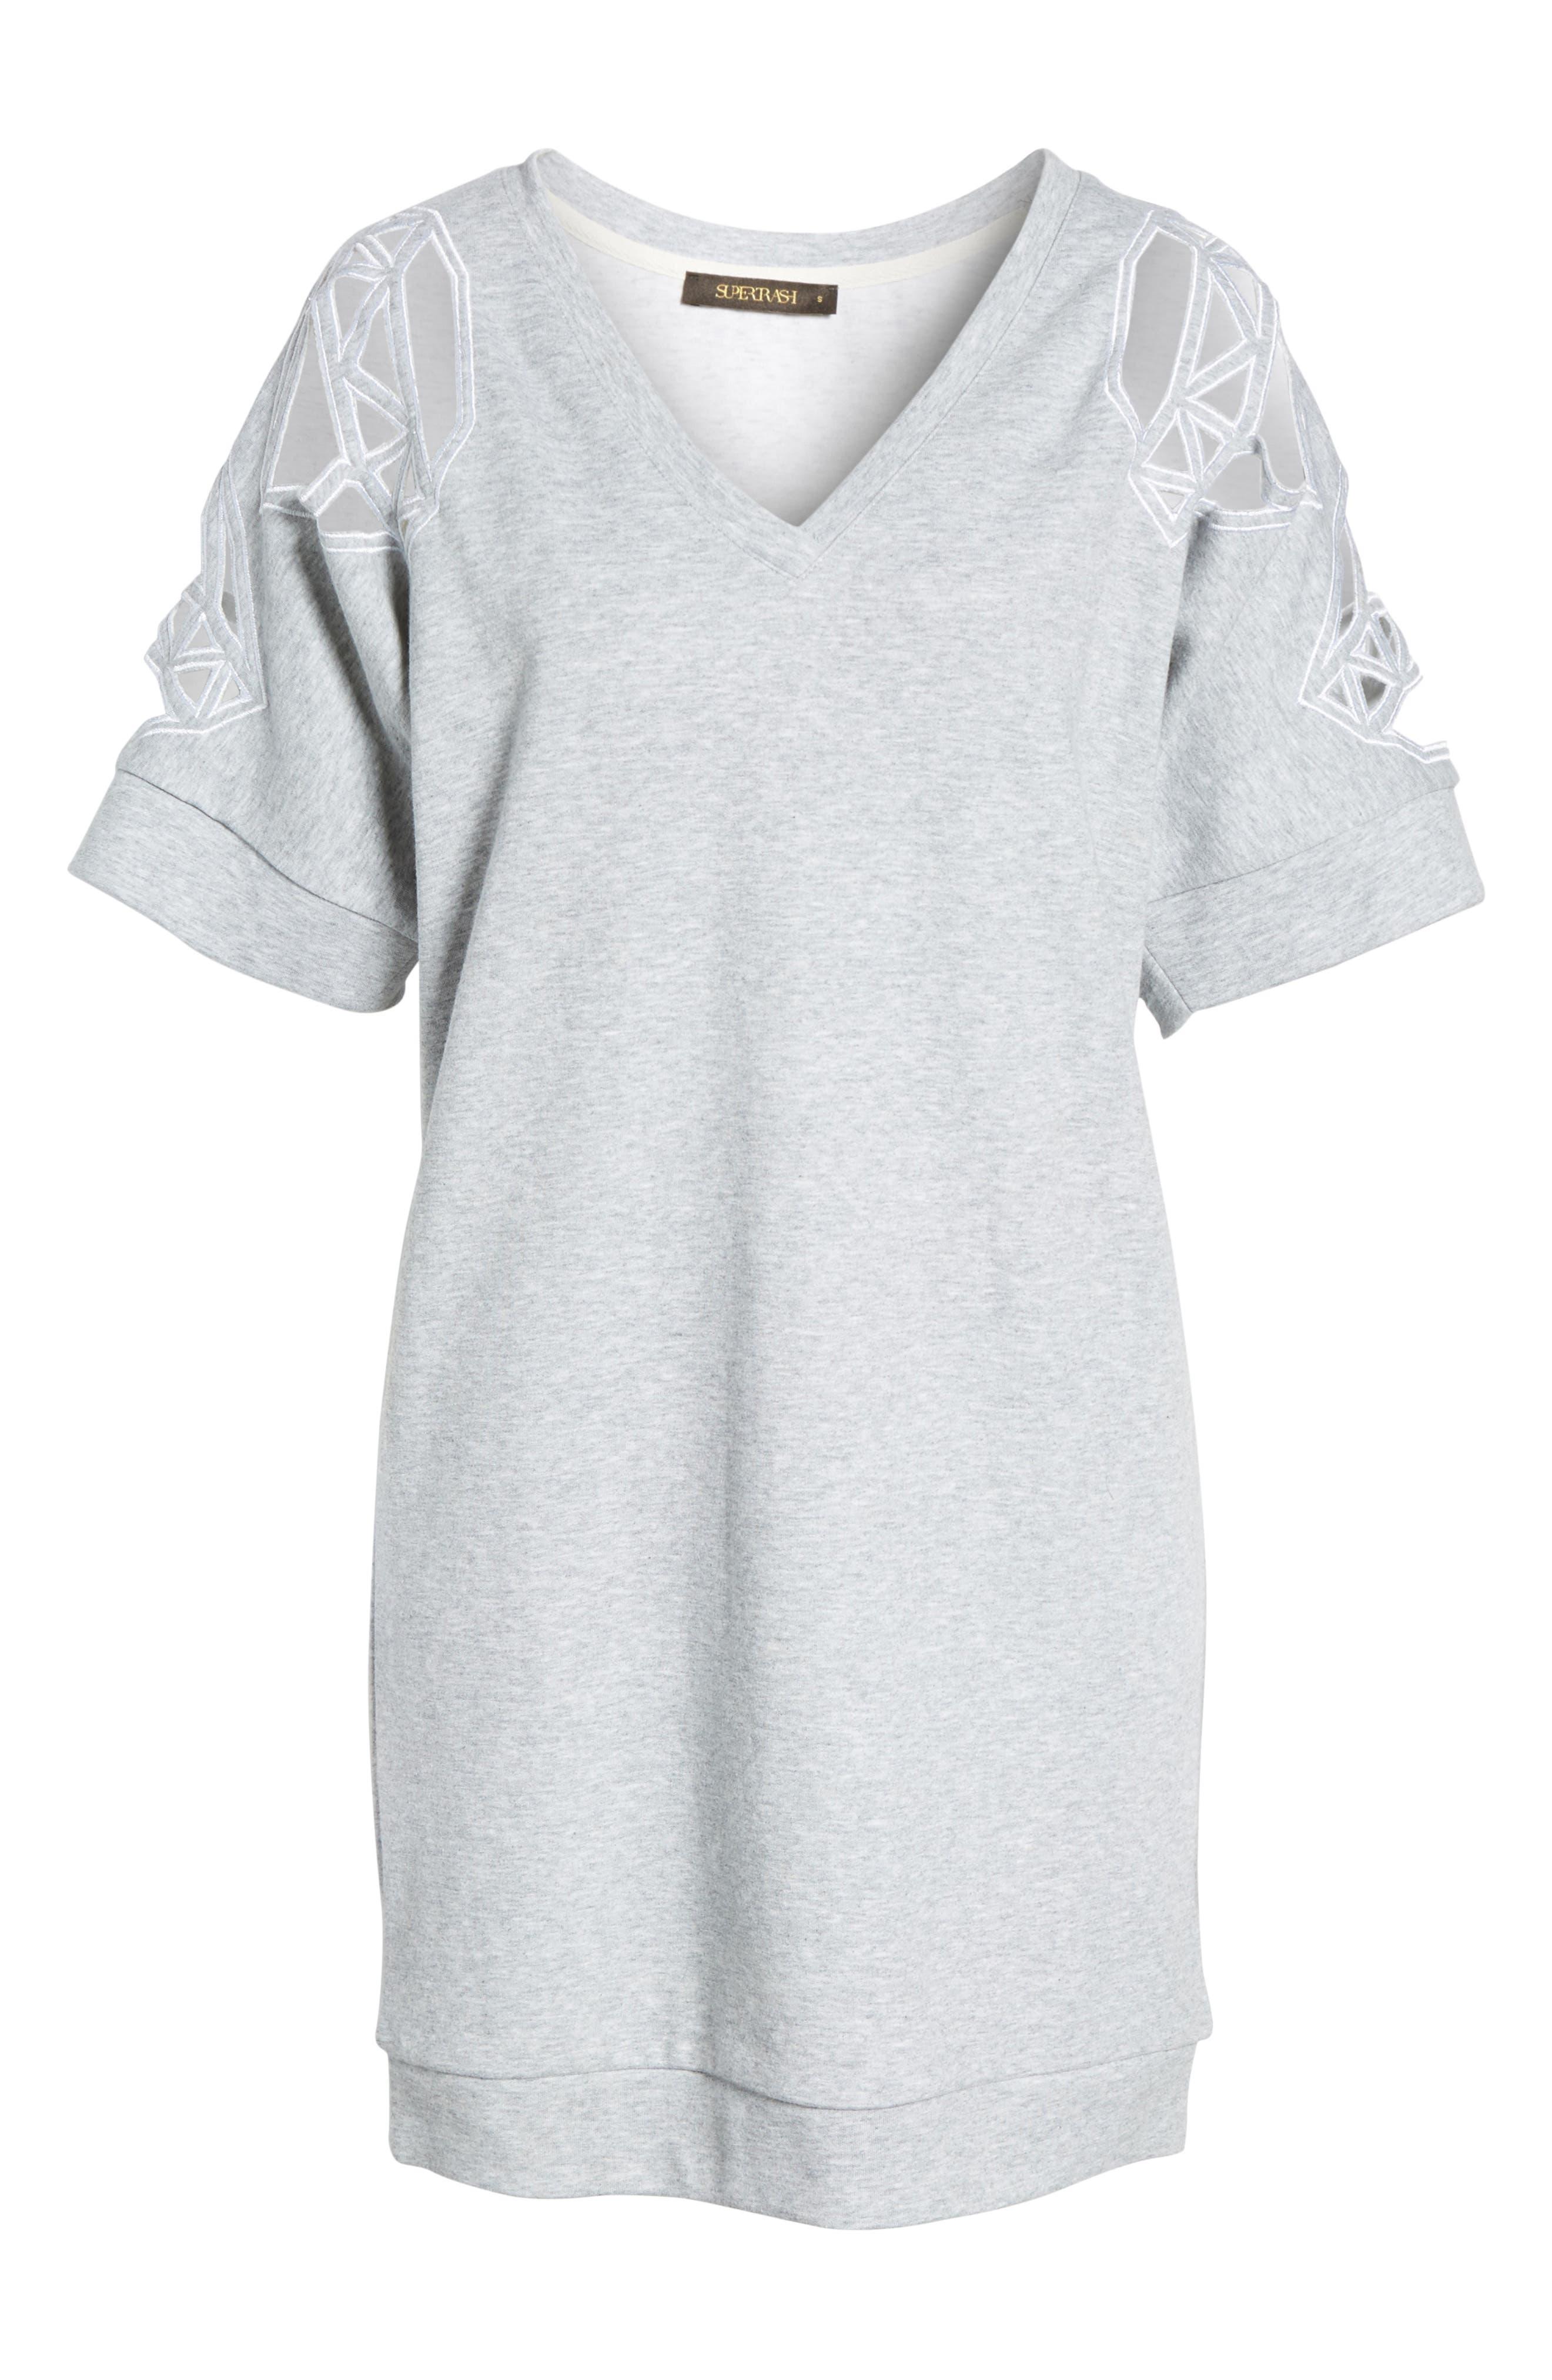 Daffic Sweatshirt Dress,                             Alternate thumbnail 6, color,                             020